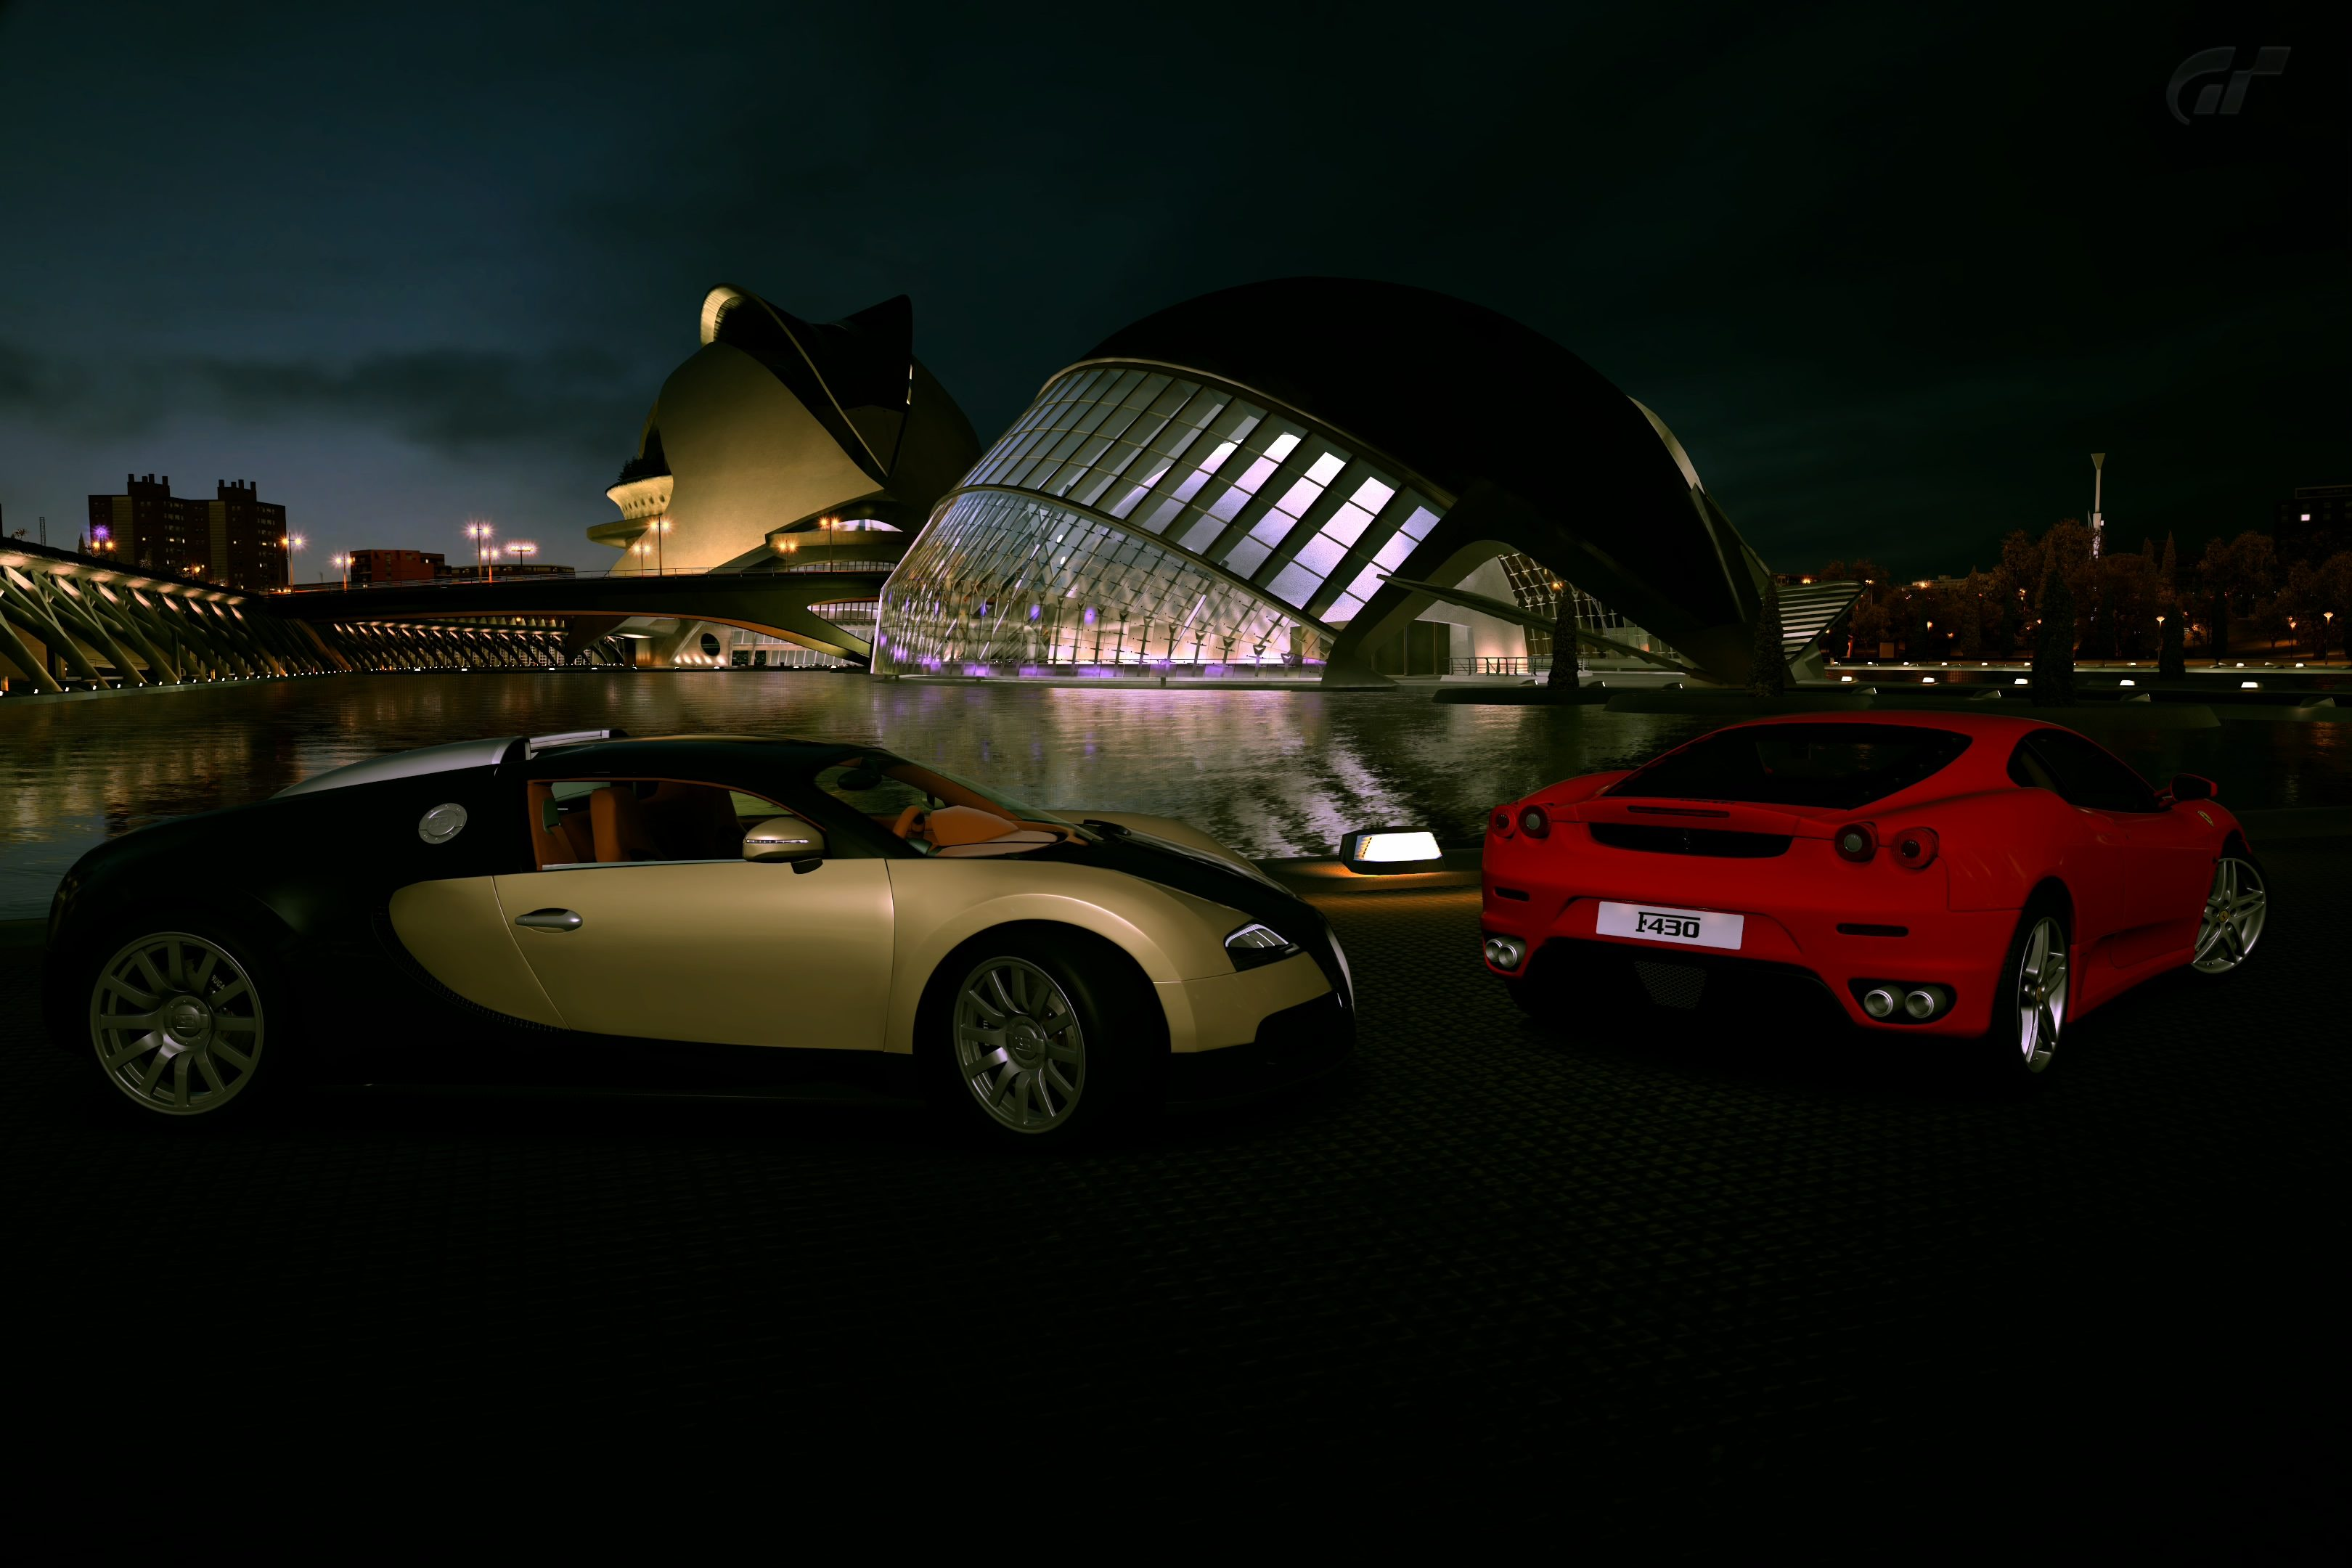 City of Arts and Sciences - Night_5.jpg